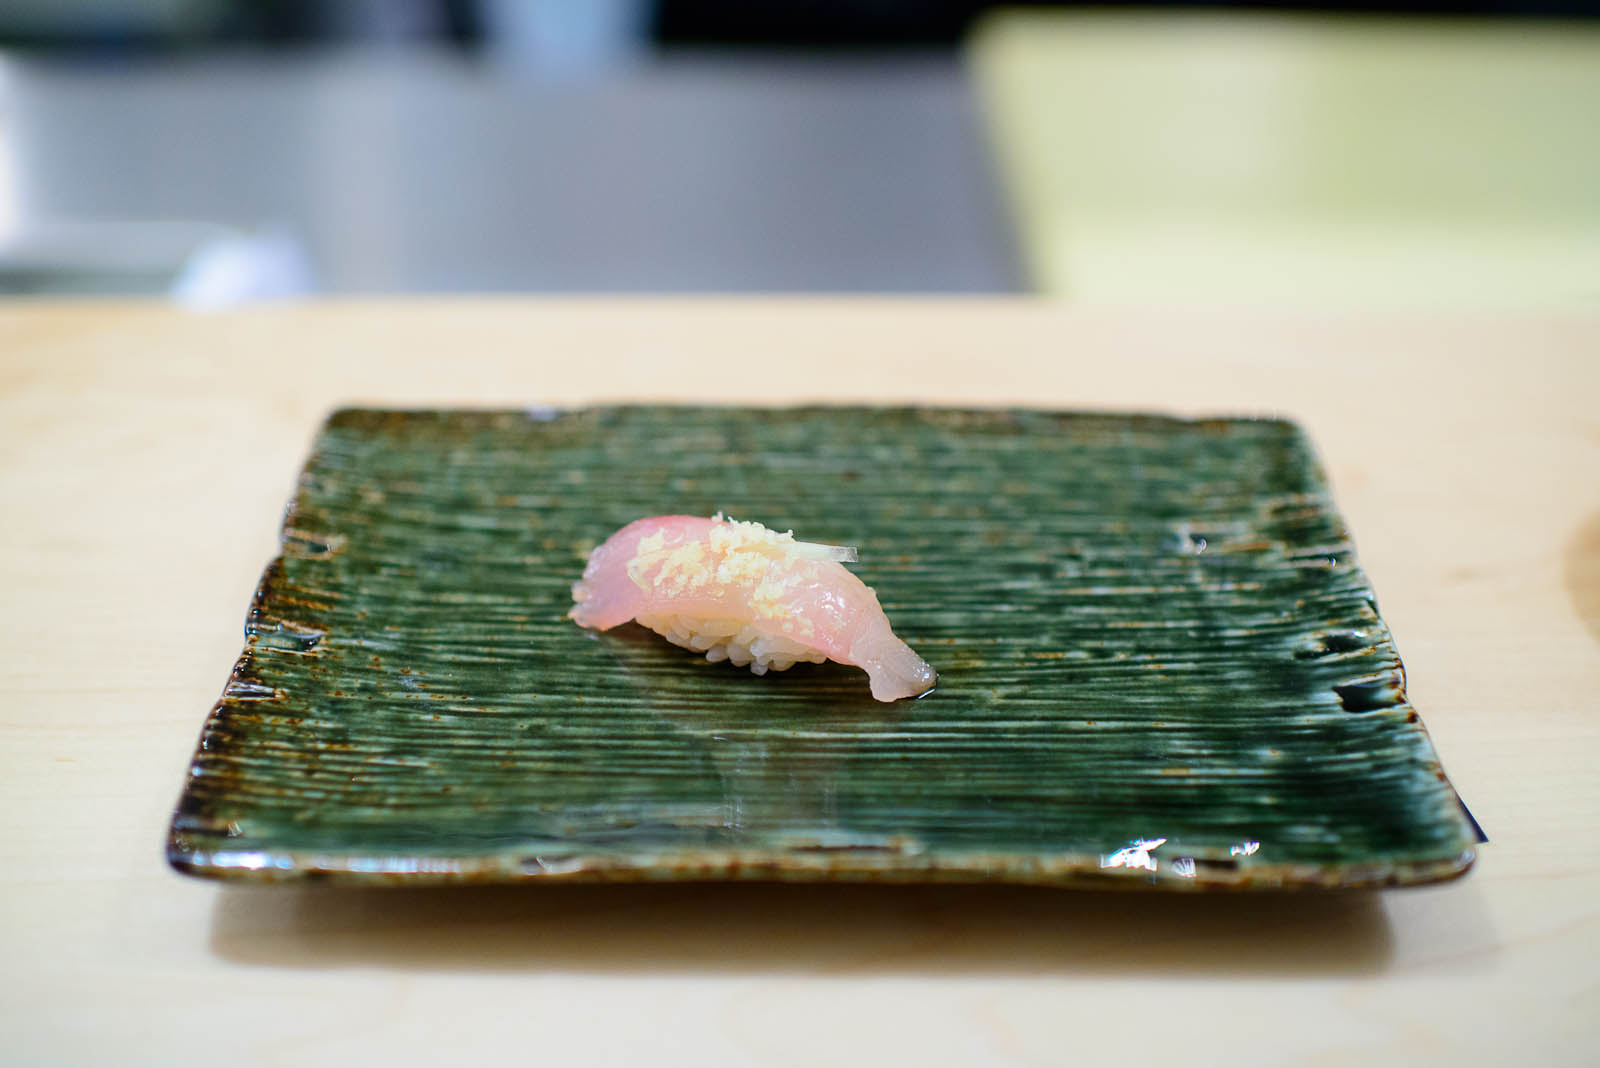 7th Course: Mackerel with crunchy rice